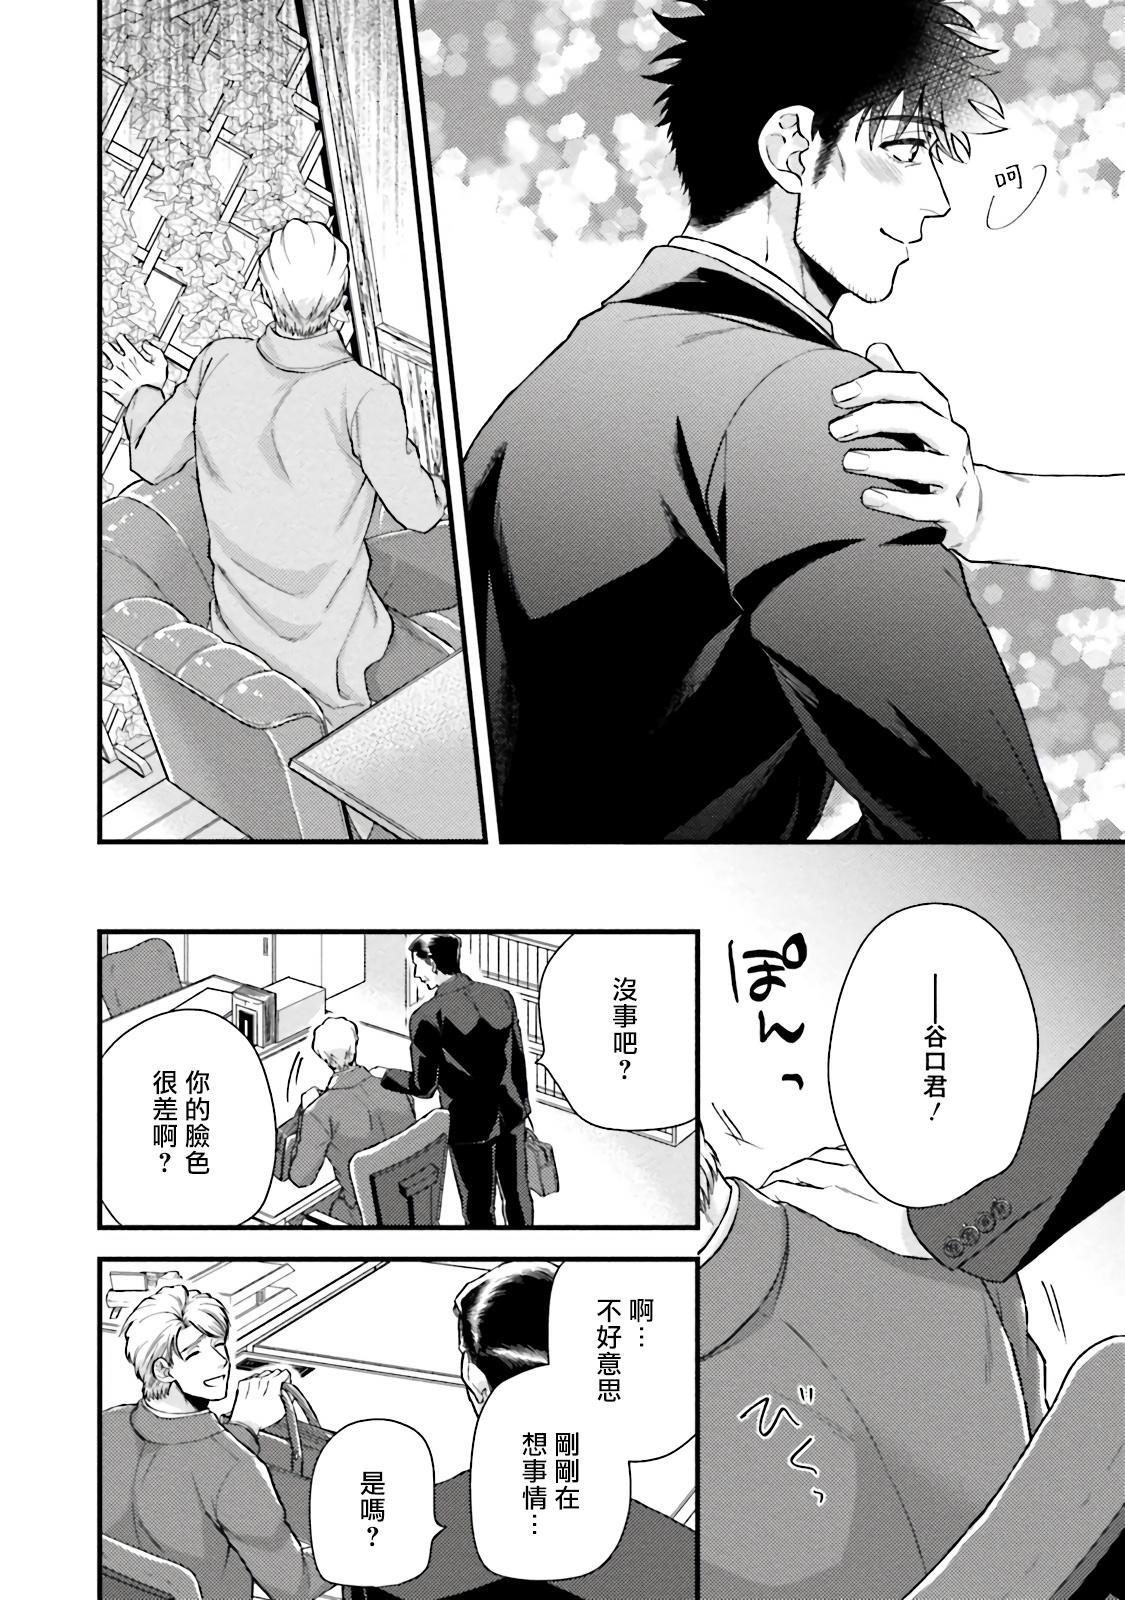 Kinou wa Otanoshimi Deshita ne | 昨天过得很愉快吧 Ch. 1-4+特典 148